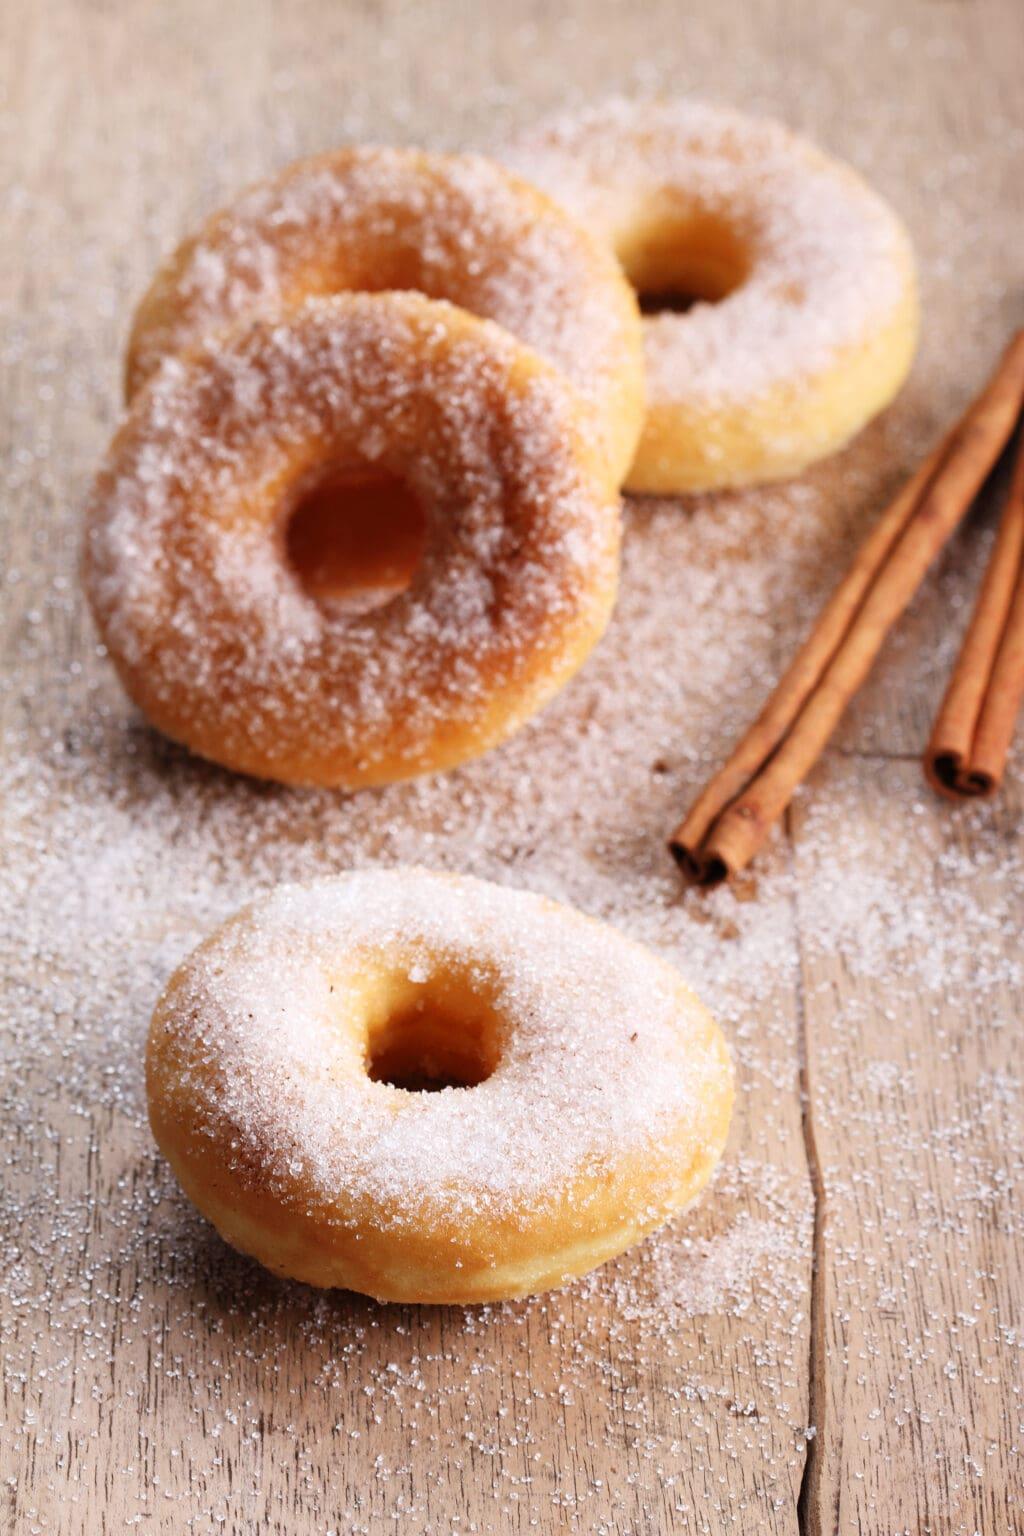 cinnamon sugar donuts on a table